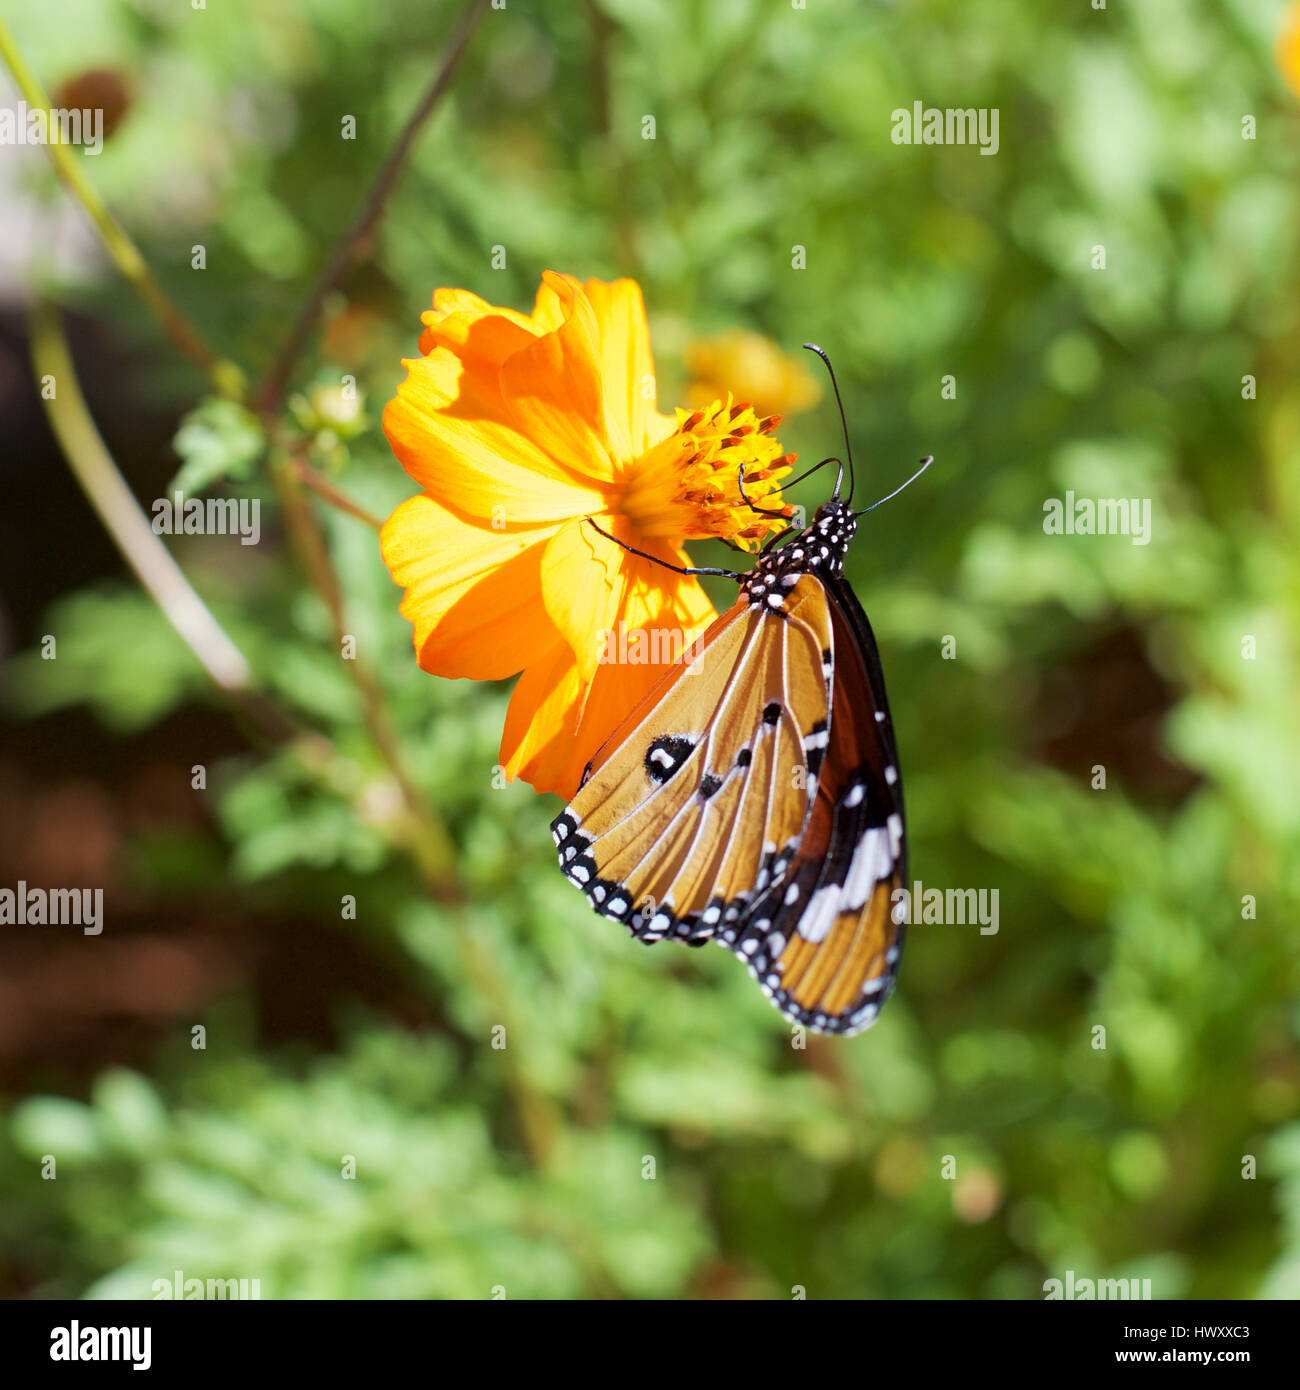 a416bcf01 Monarch Danaus chrysippus orientis, African Monarch Butterfly, Plain Tiger.  Afrikaans name: Melkbosskoenlapper on African Marigold